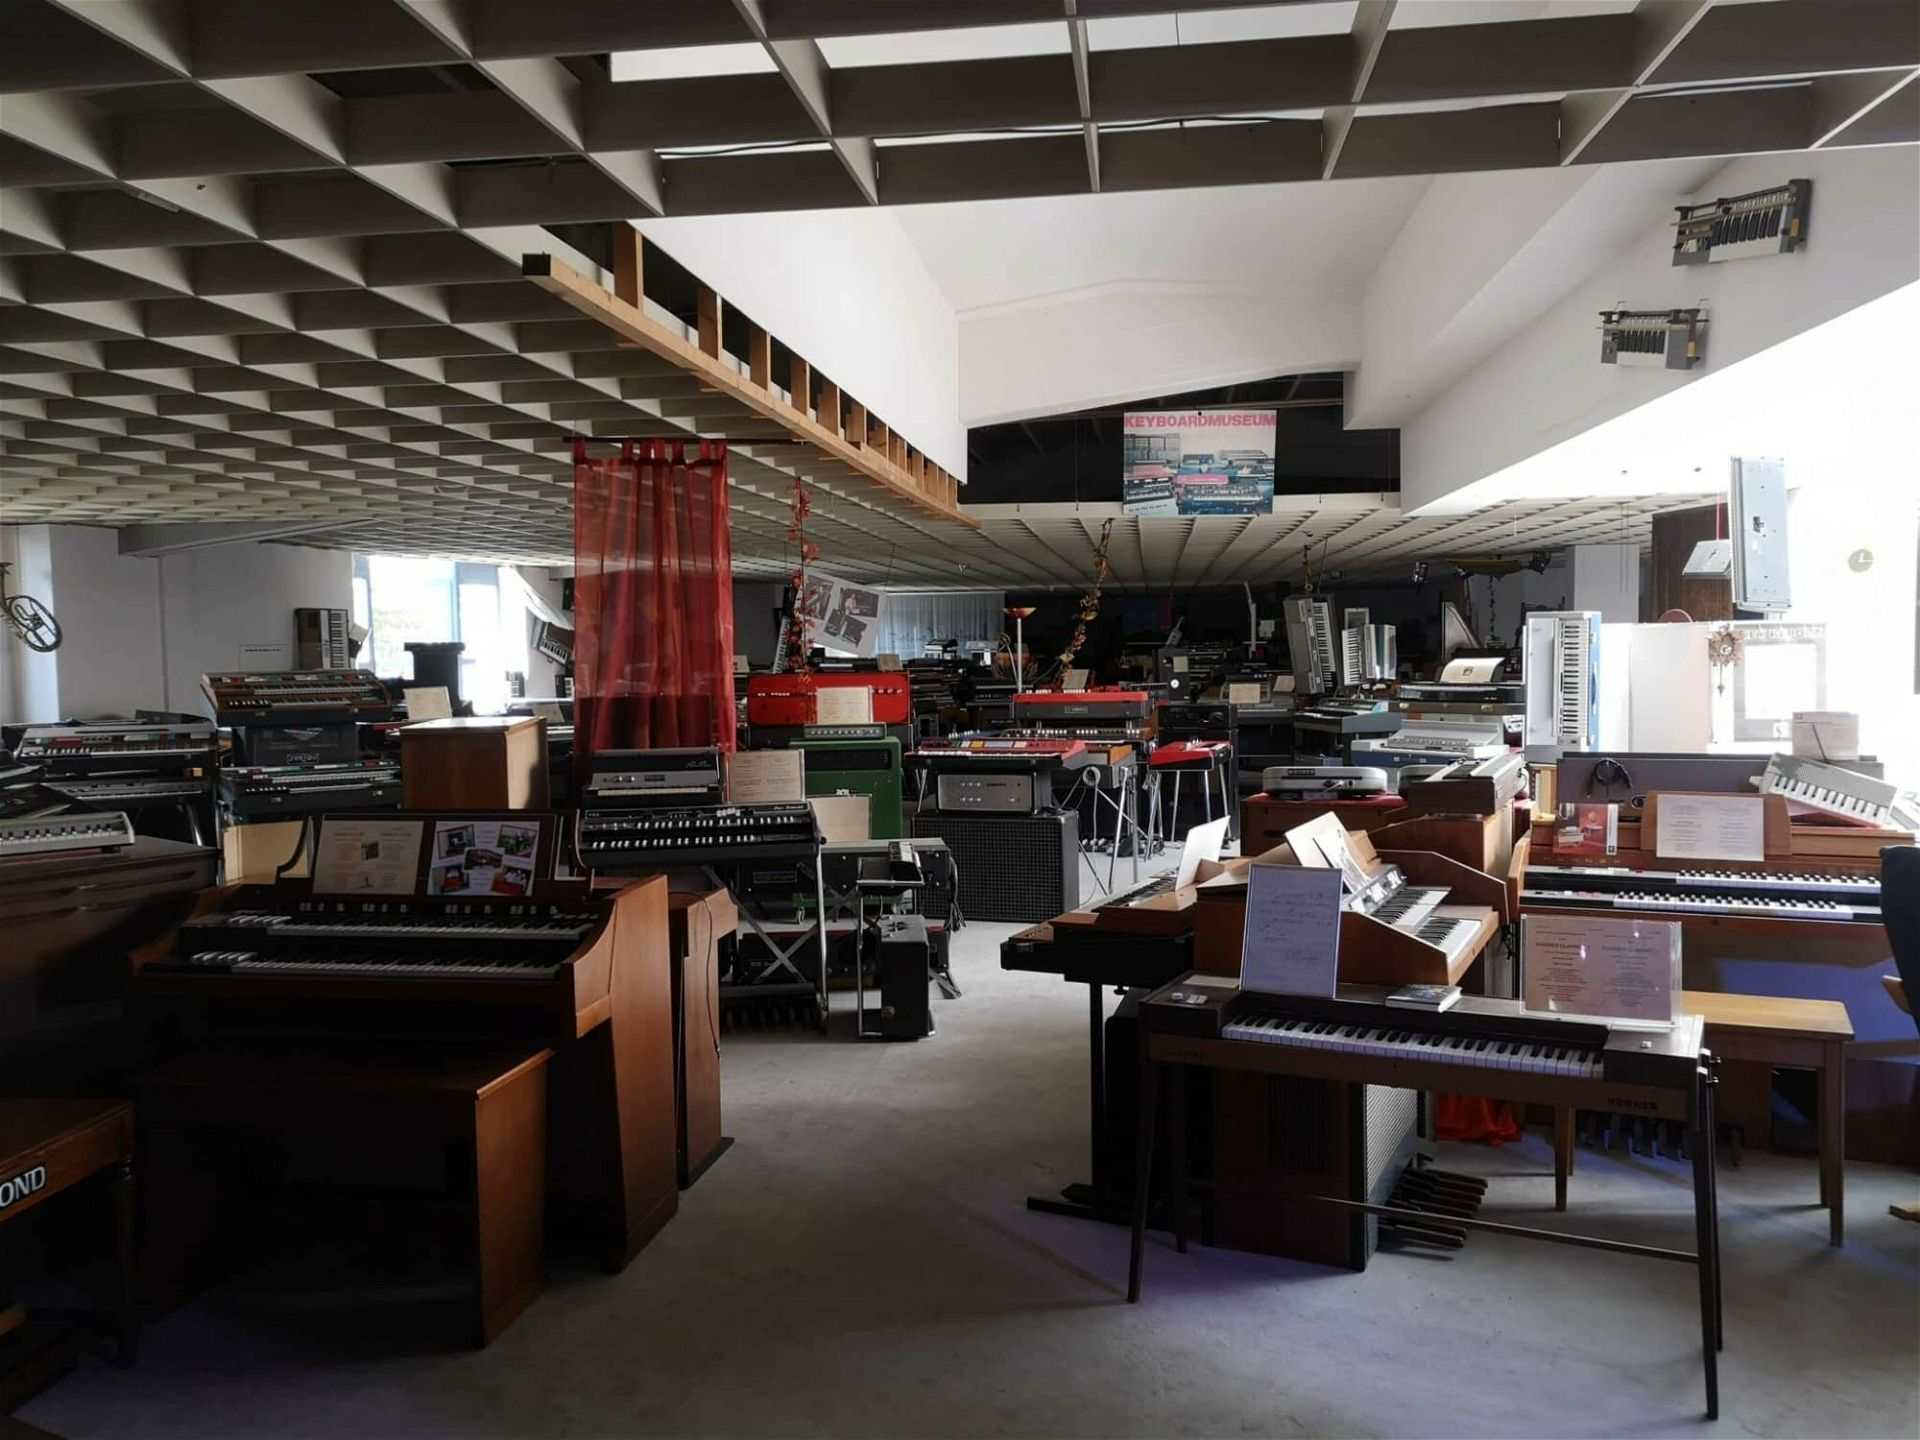 Eboardmuseum